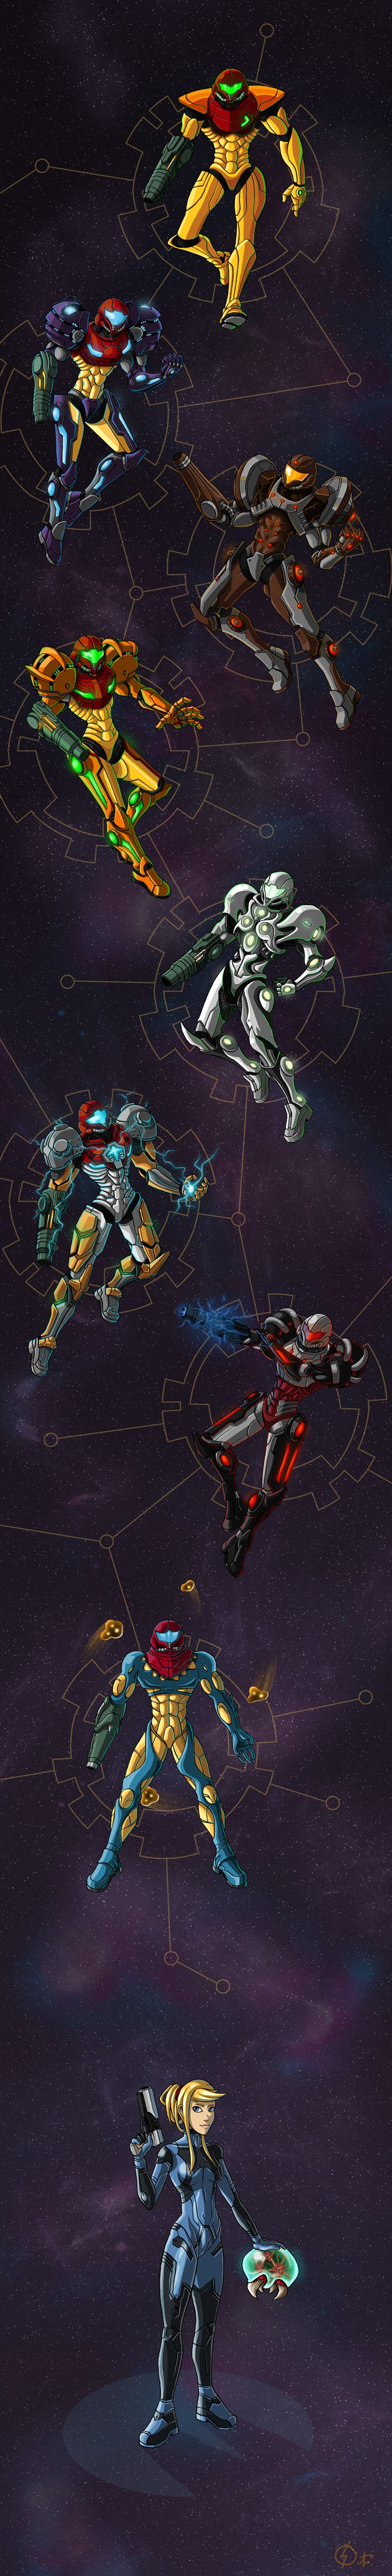 Metroid : Armored Heart by Arrarra.deviantart.com on @deviantART